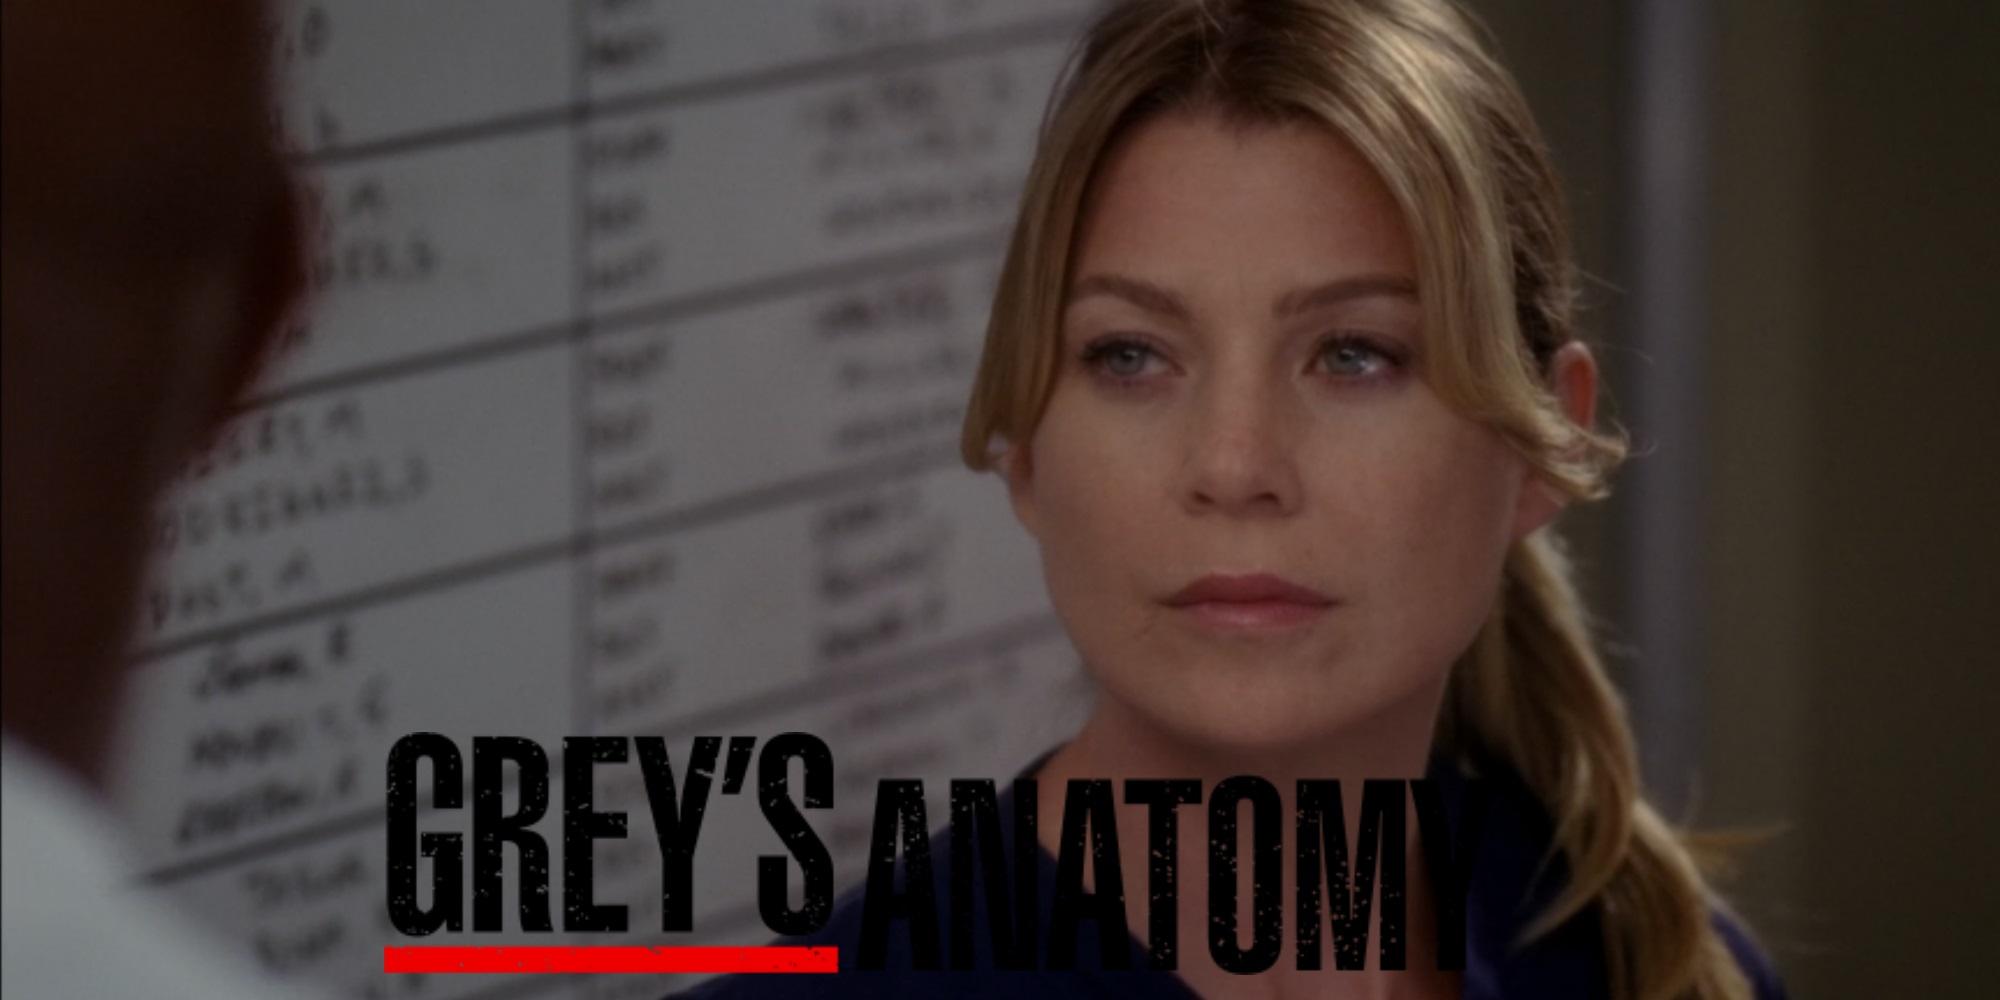 Greys anatomy temporada 10 poster - Humsafars 16th october 2014 ...